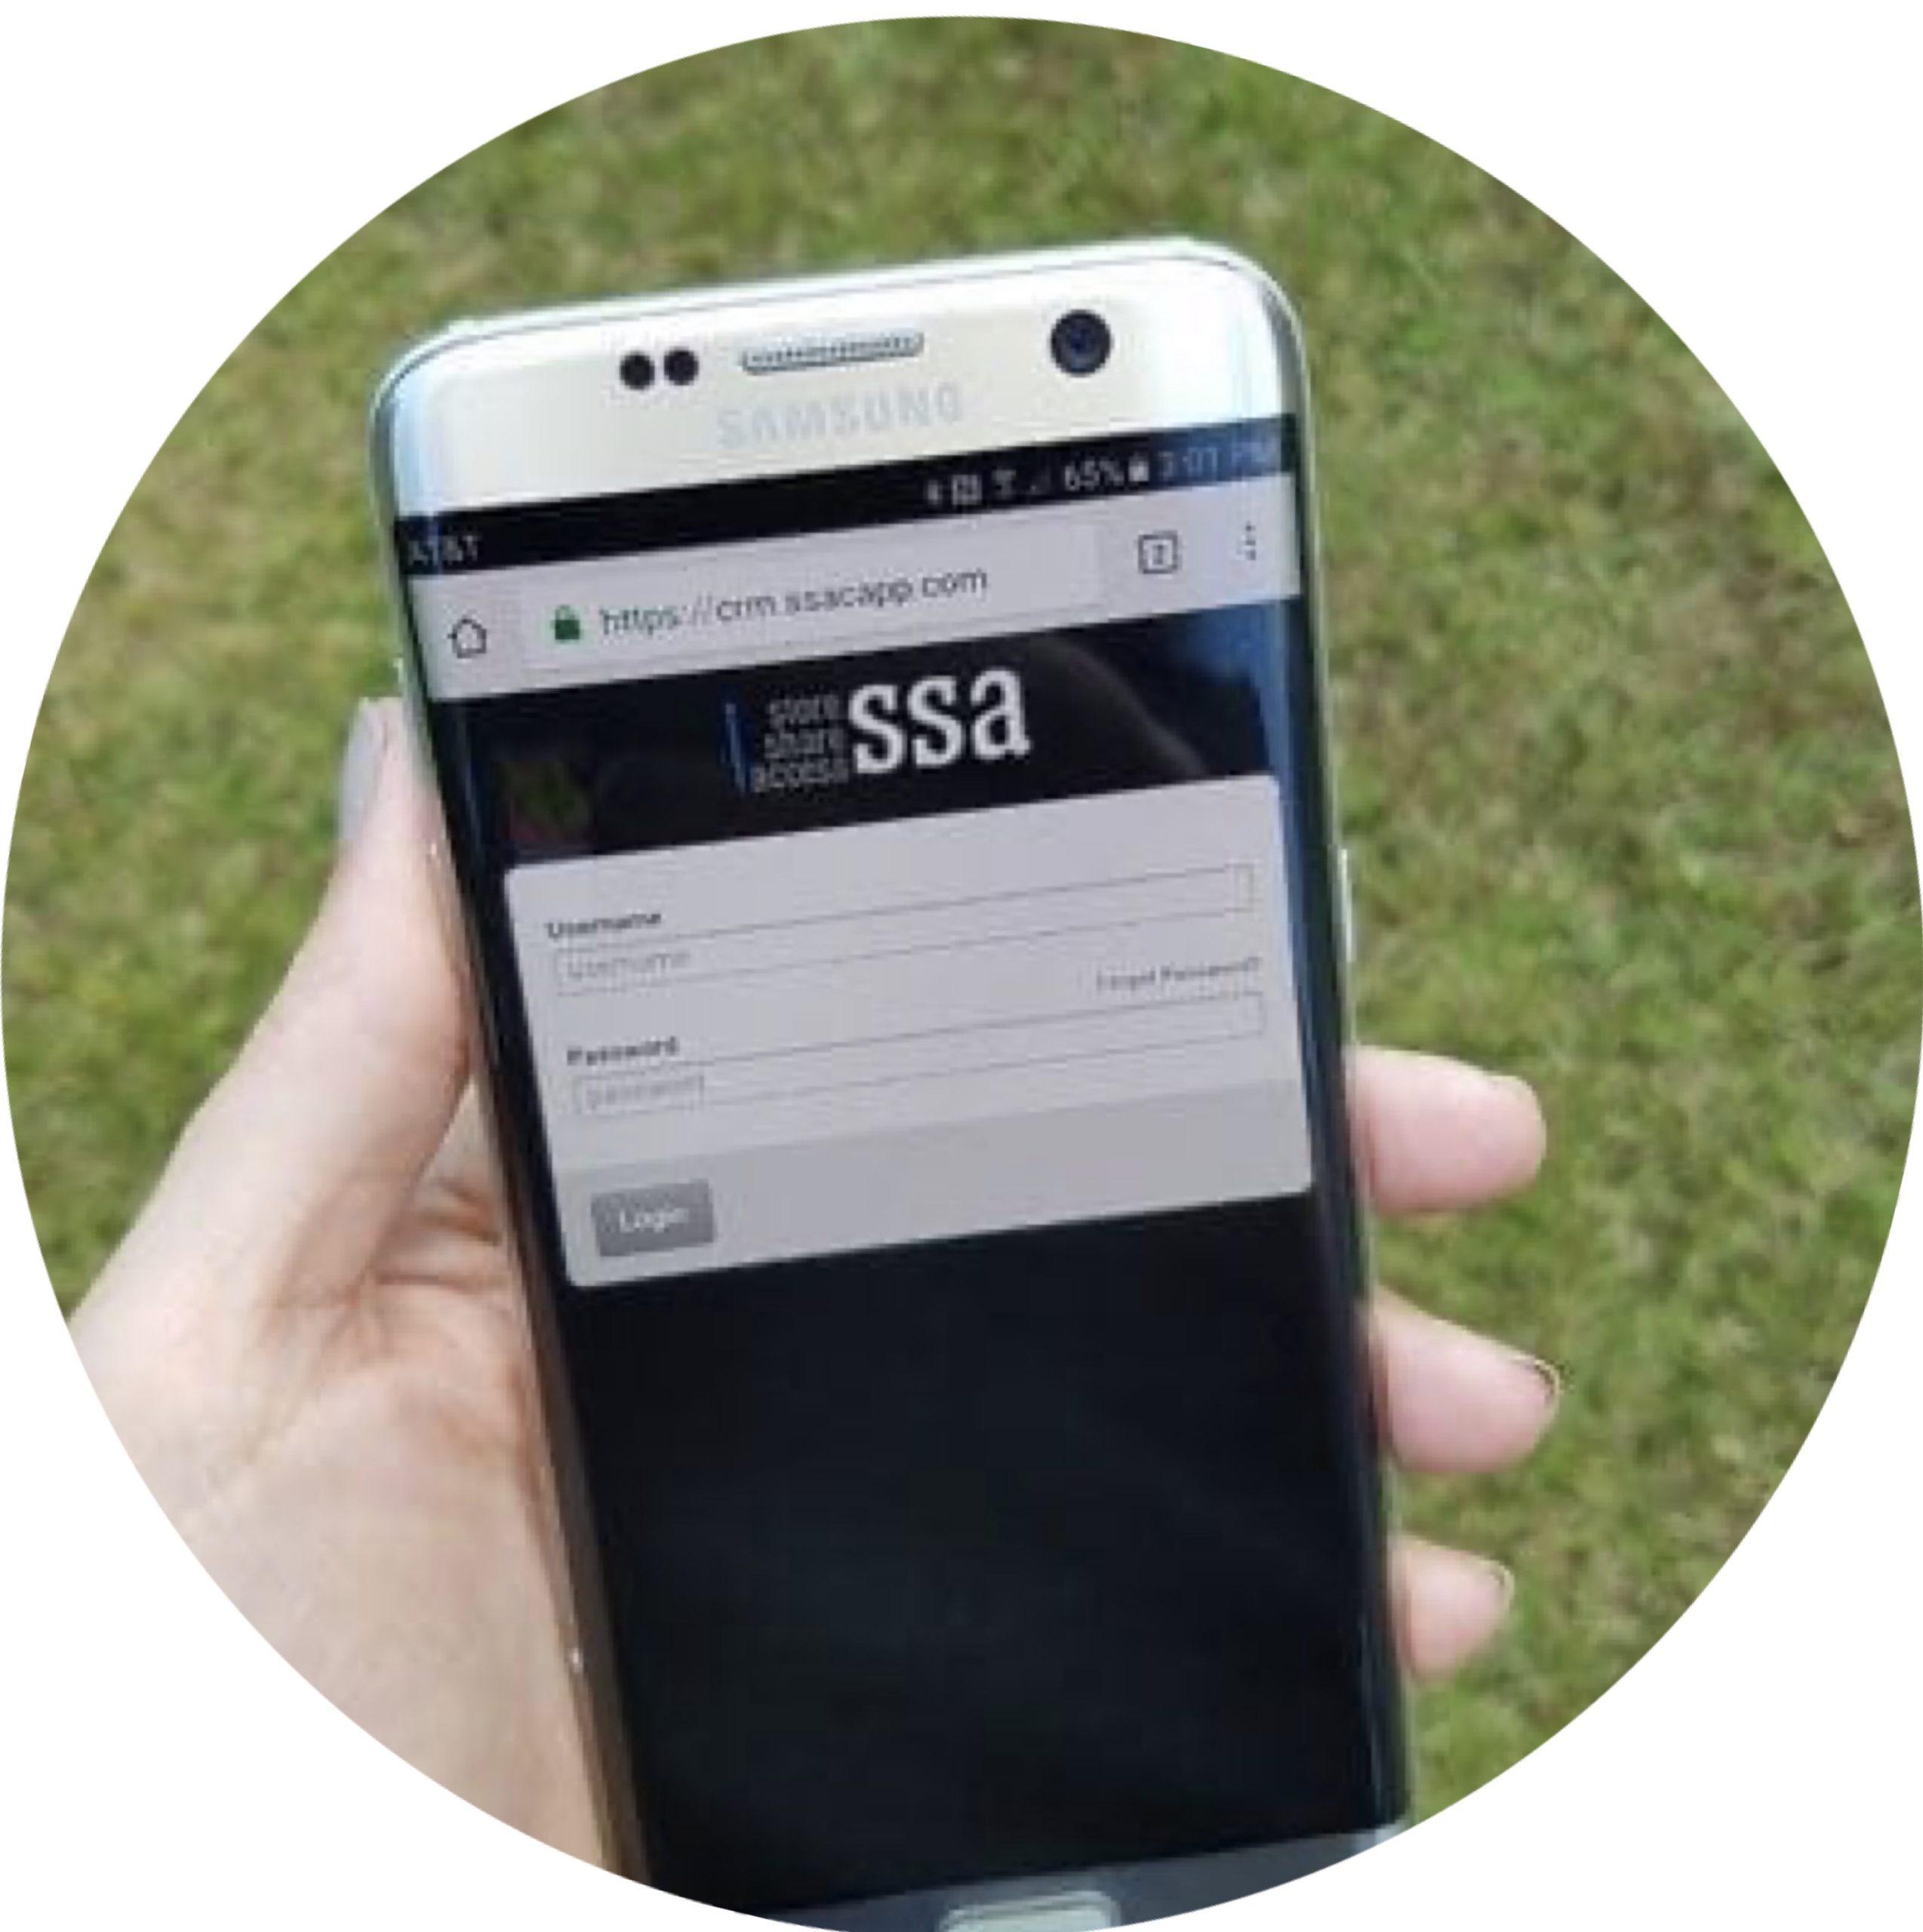 SSA app on samsung